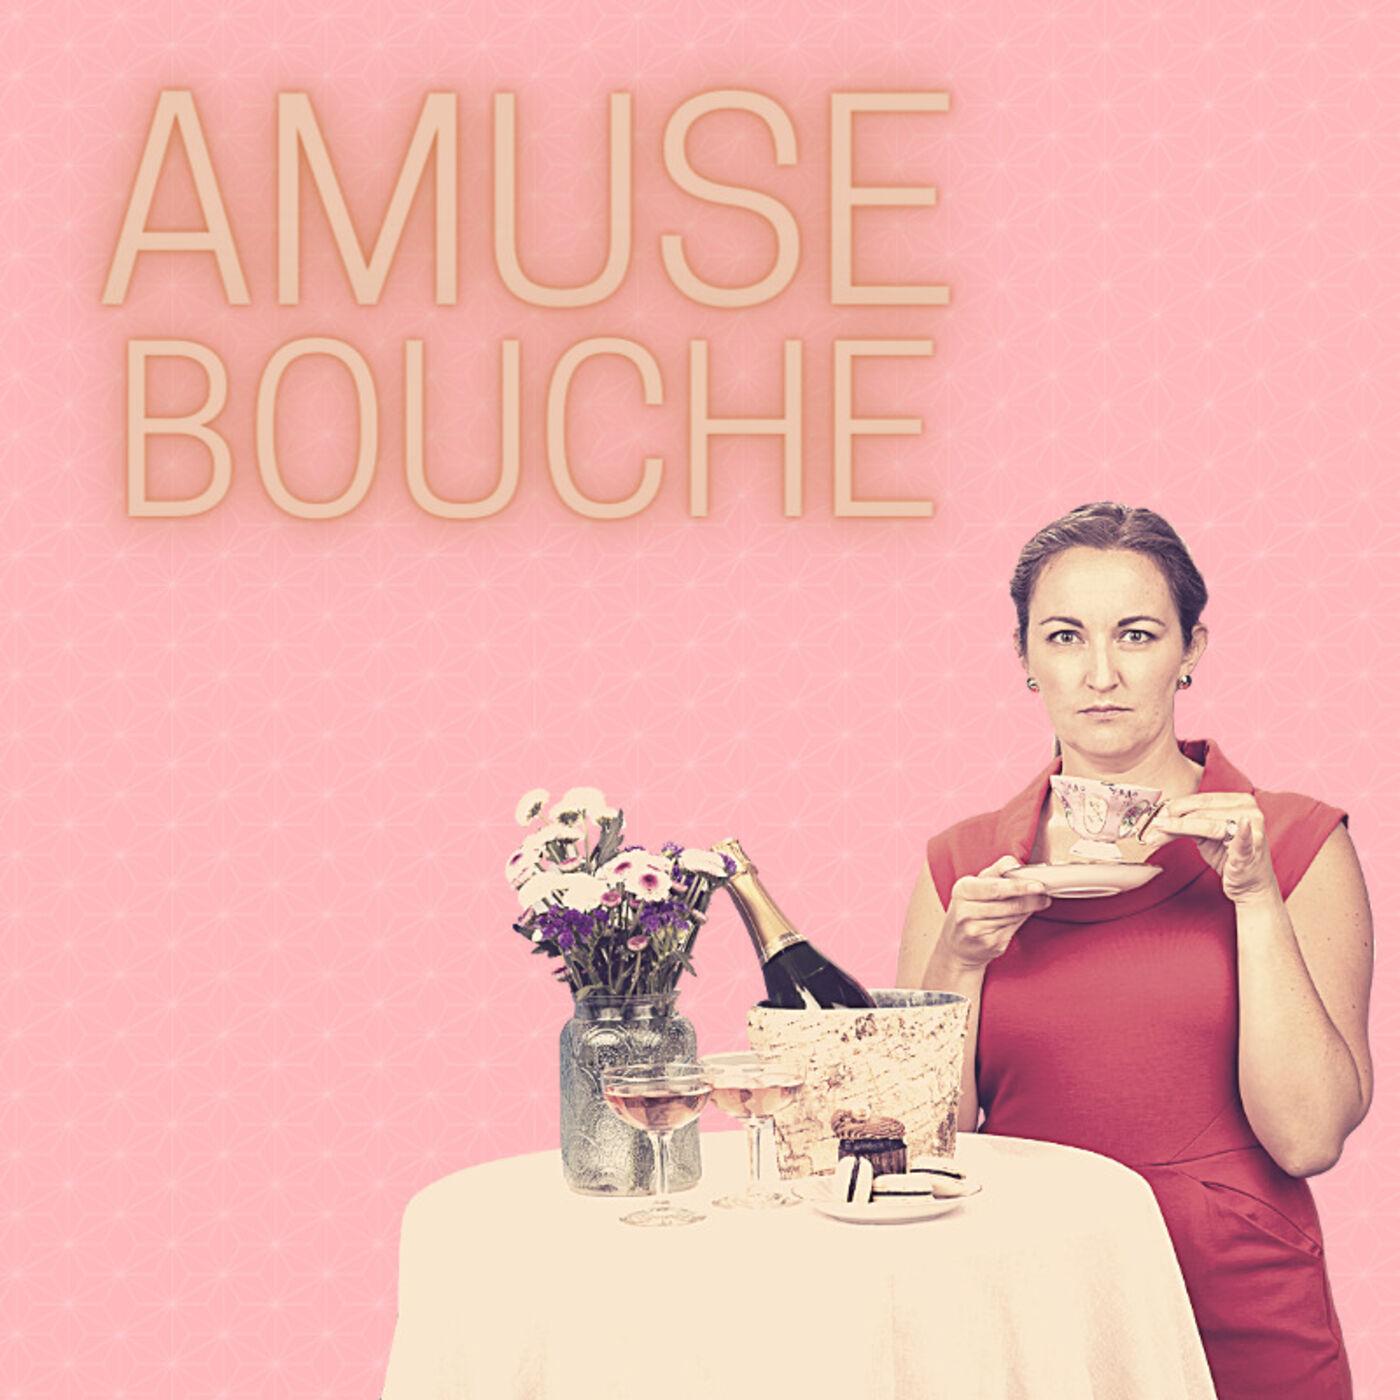 It's (almost) my Birthday! - Amuse Bouche #12